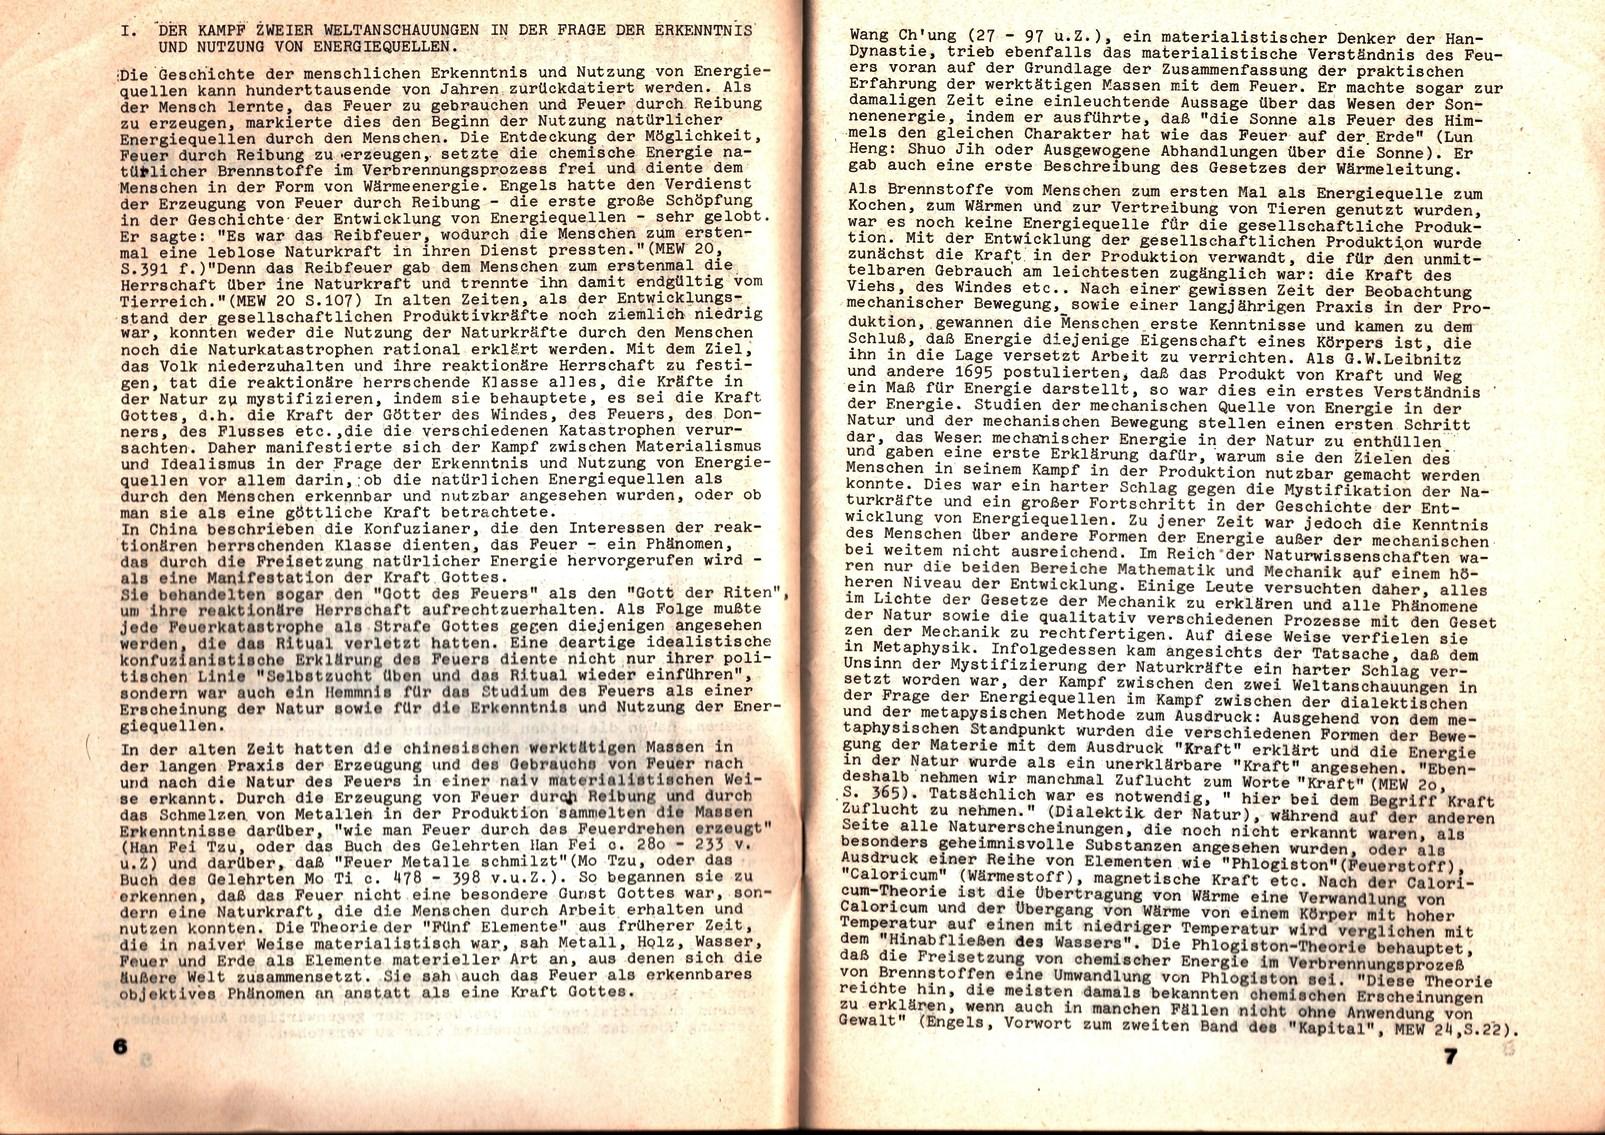 KSV_1976_Atomenergie_im_Kapitalismus_005